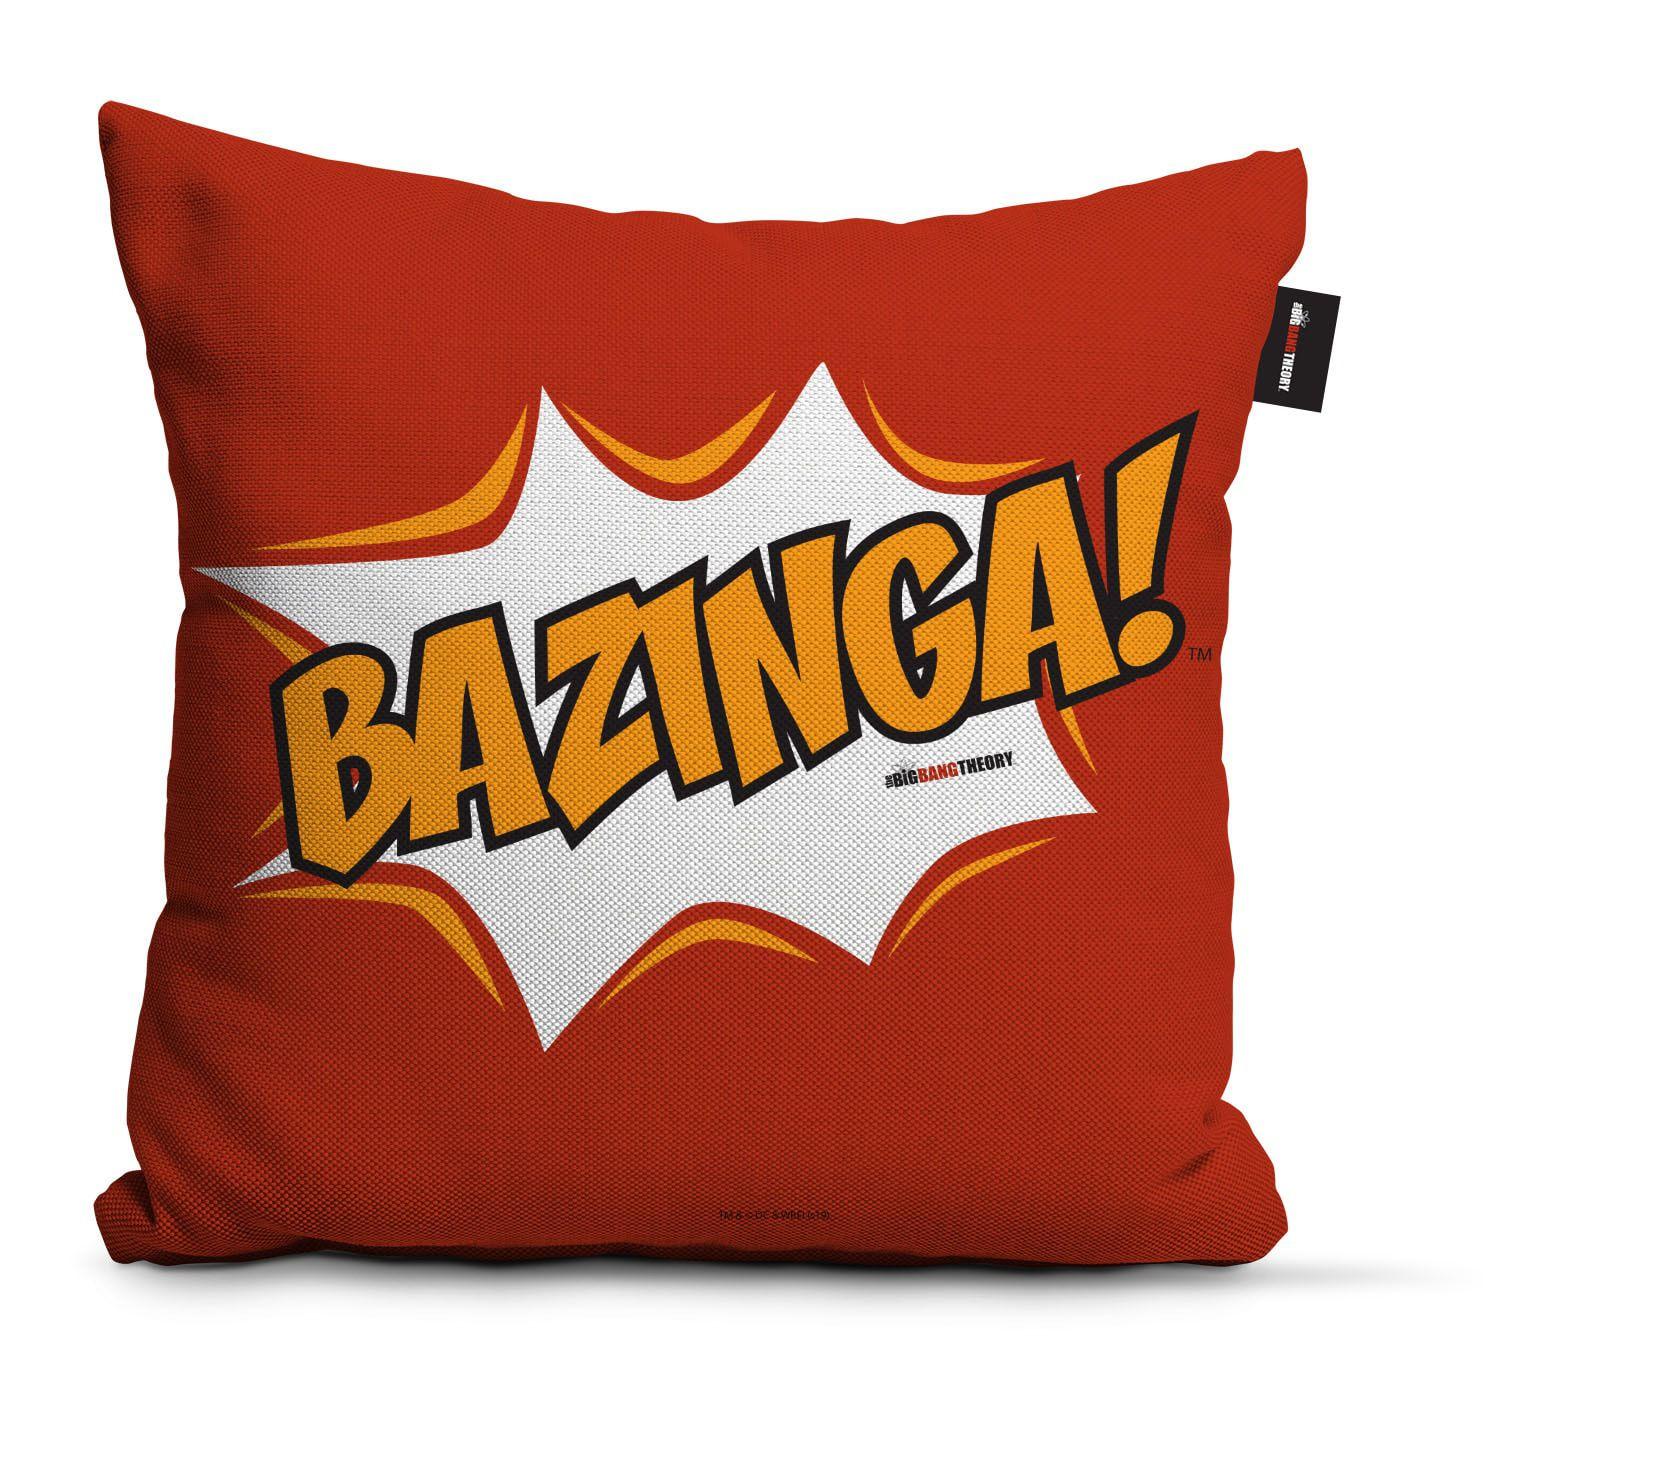 Almofada Vermelho Bazinga: Big Bang Theory - Urban